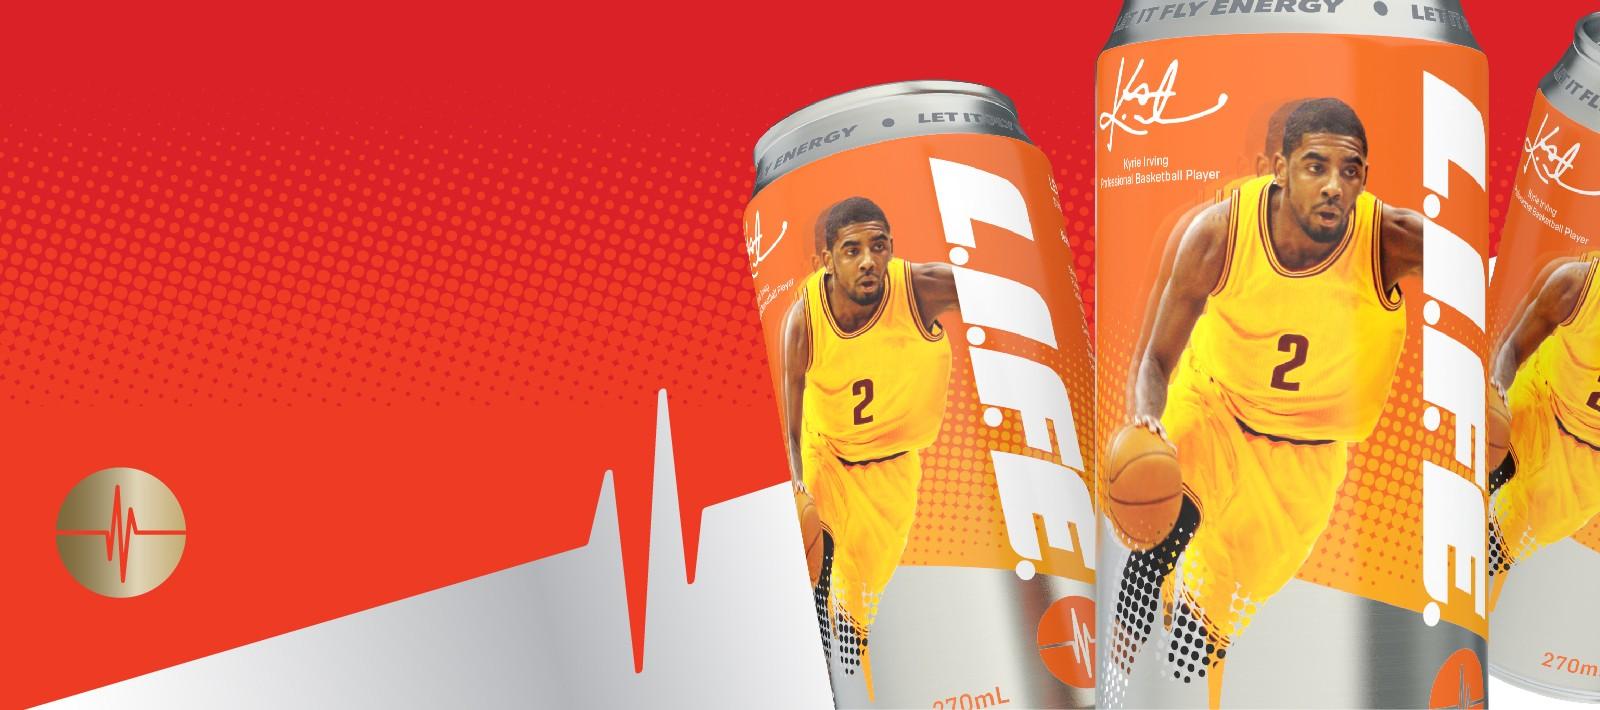 Beverage brand identity design for energy drink